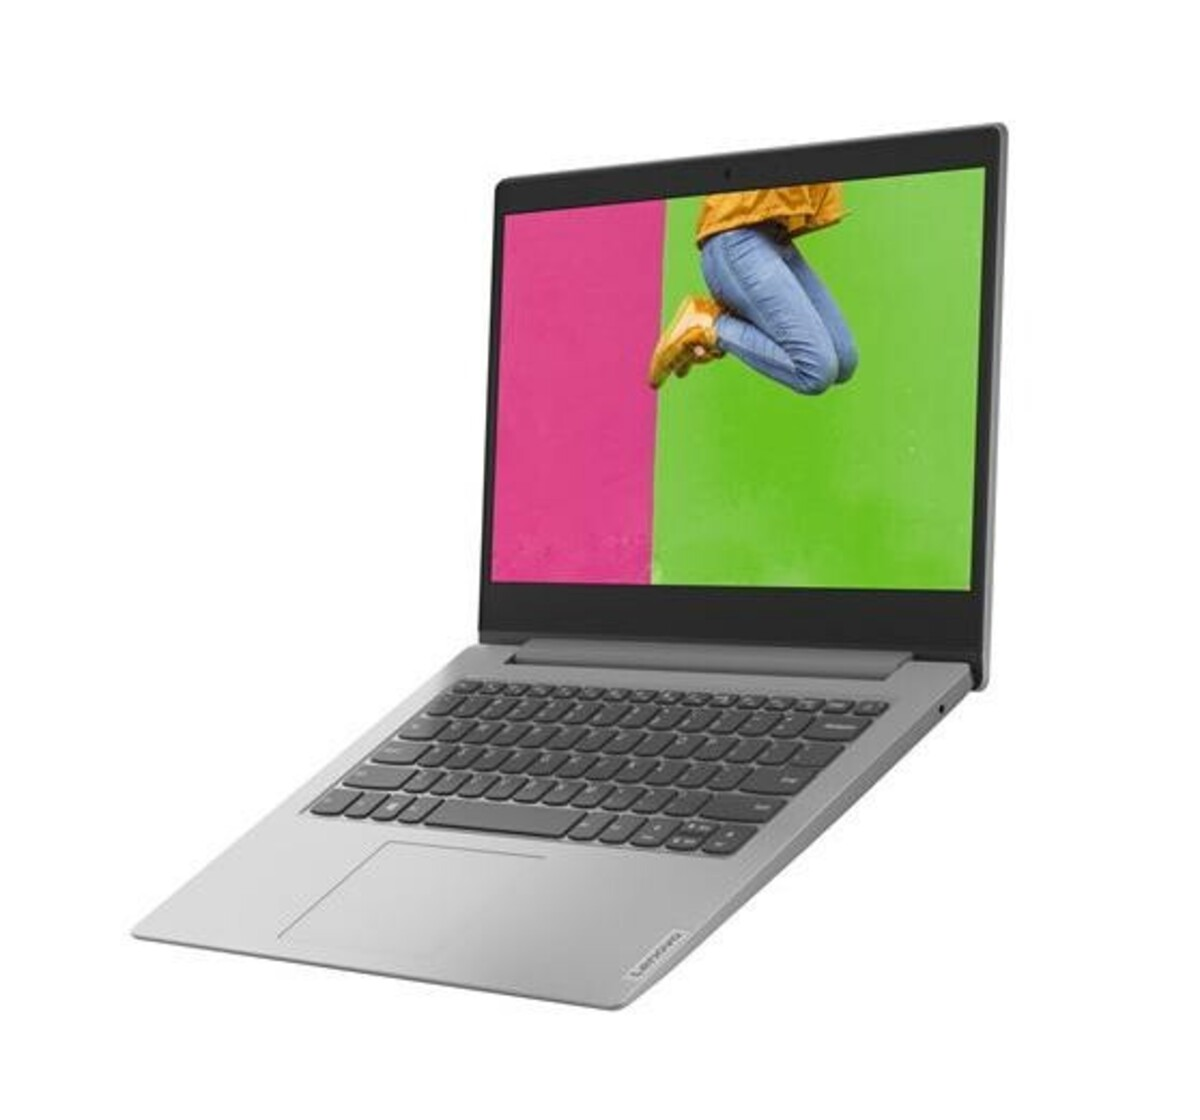 Bild 1 von Lenovo IdeaPad 1i 14ILG05 platinum grey Notebook (Intel Celeron N4020, 4 GB RAM, 128 GB SSD, integrated graphic, 14 Zoll FHD matt, Win 10 S)